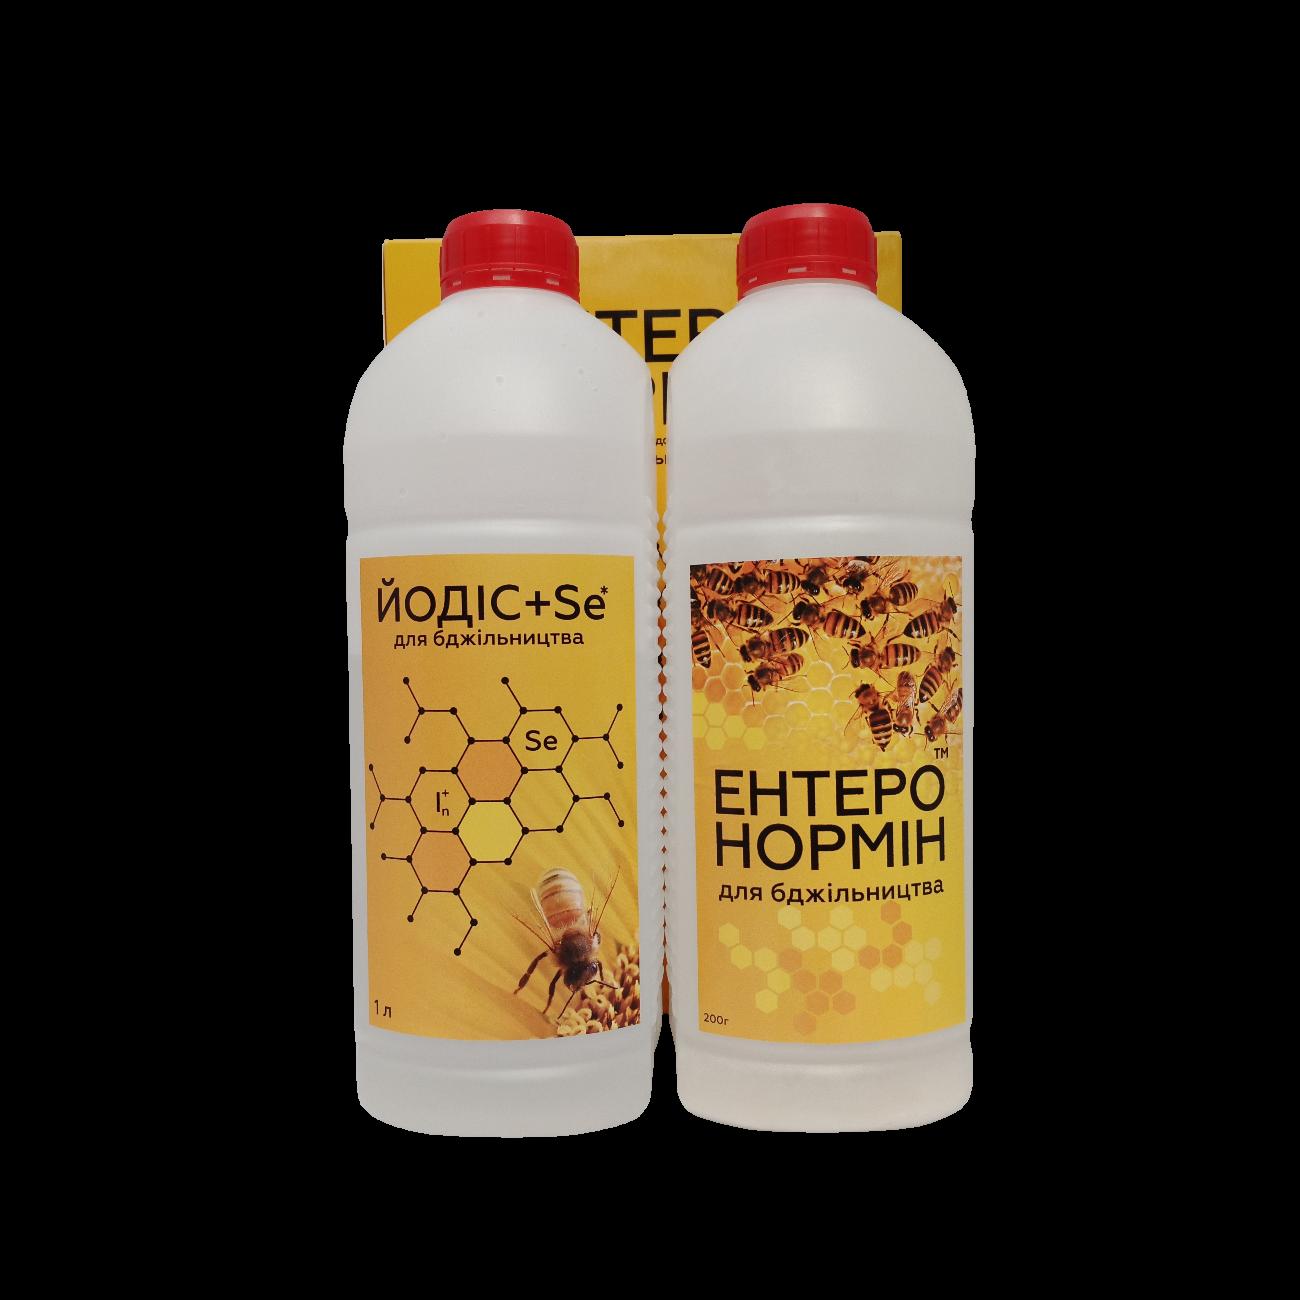 ЭНТЕРОНОРМИН™ с Йодис+Se для пчеловодства (200г+1000мл)